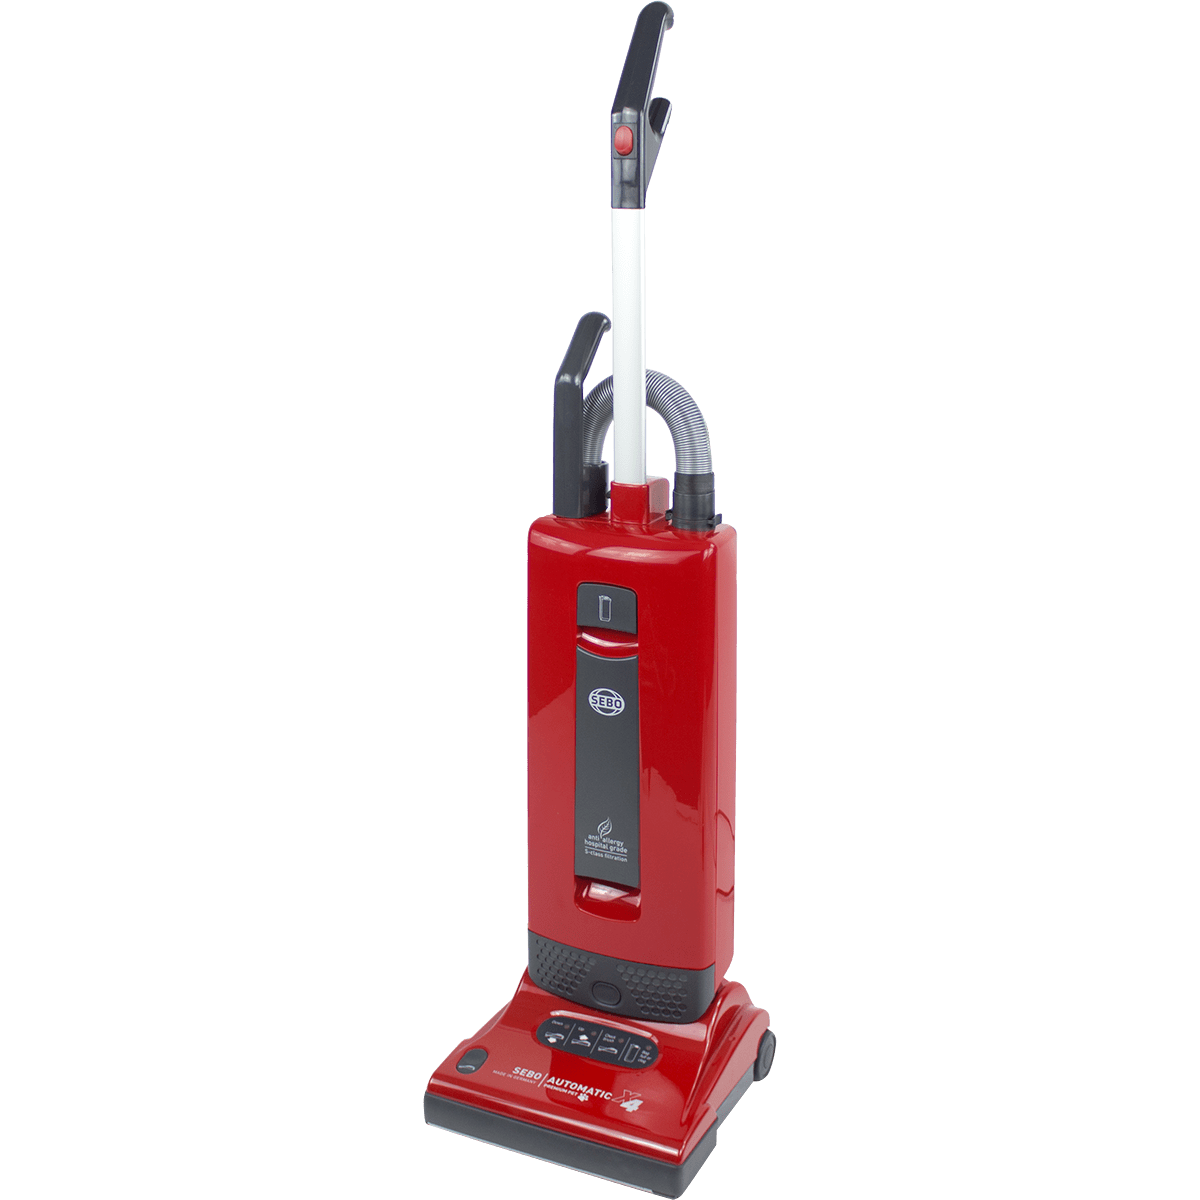 SEBO 9559AM Automatic X4 Pet Upright Vacuum Cleaner | Sylvane